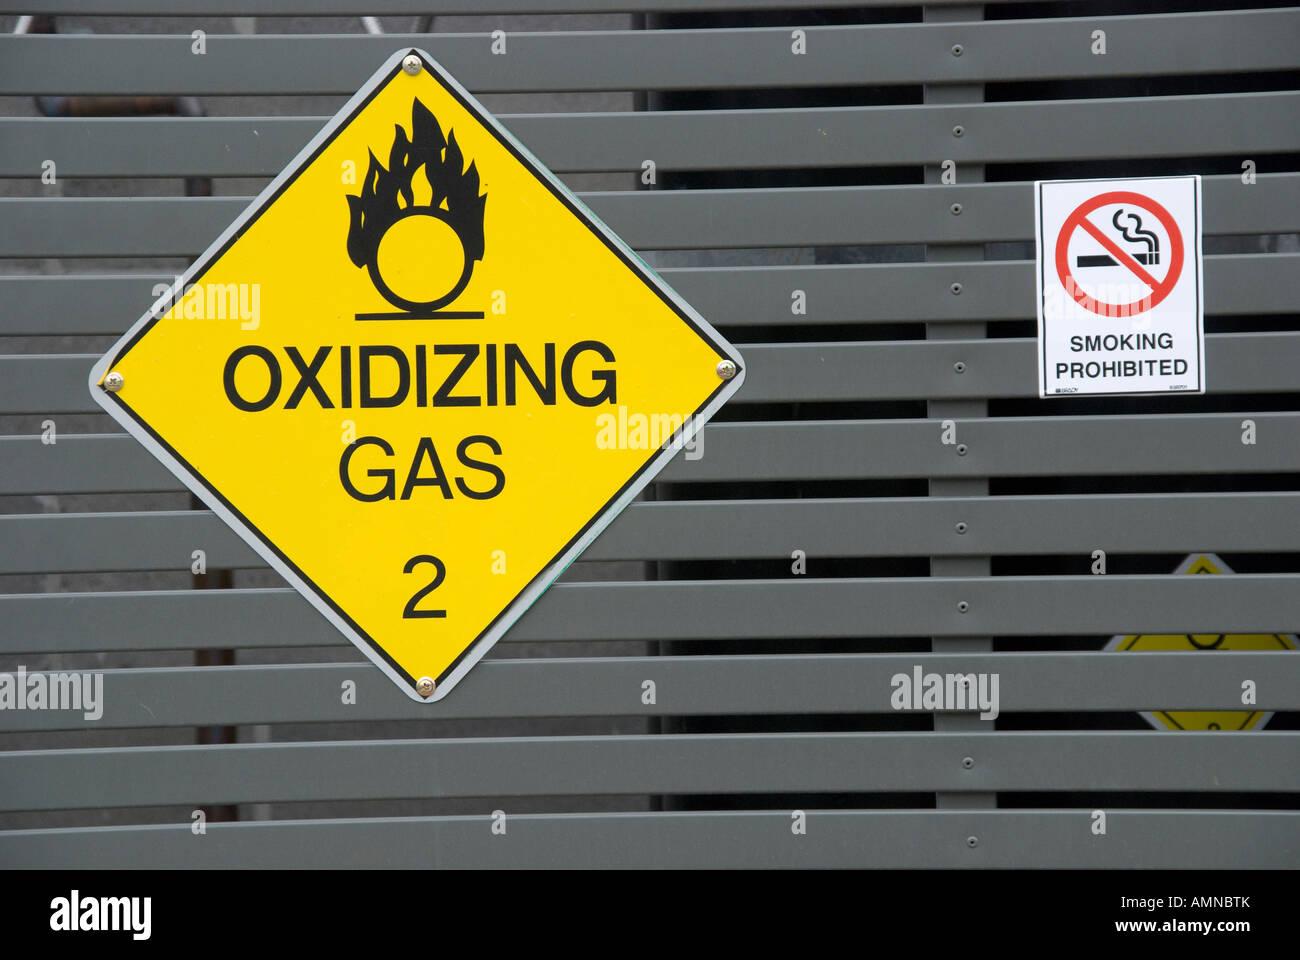 Sign warning of oxidising gas - Stock Image